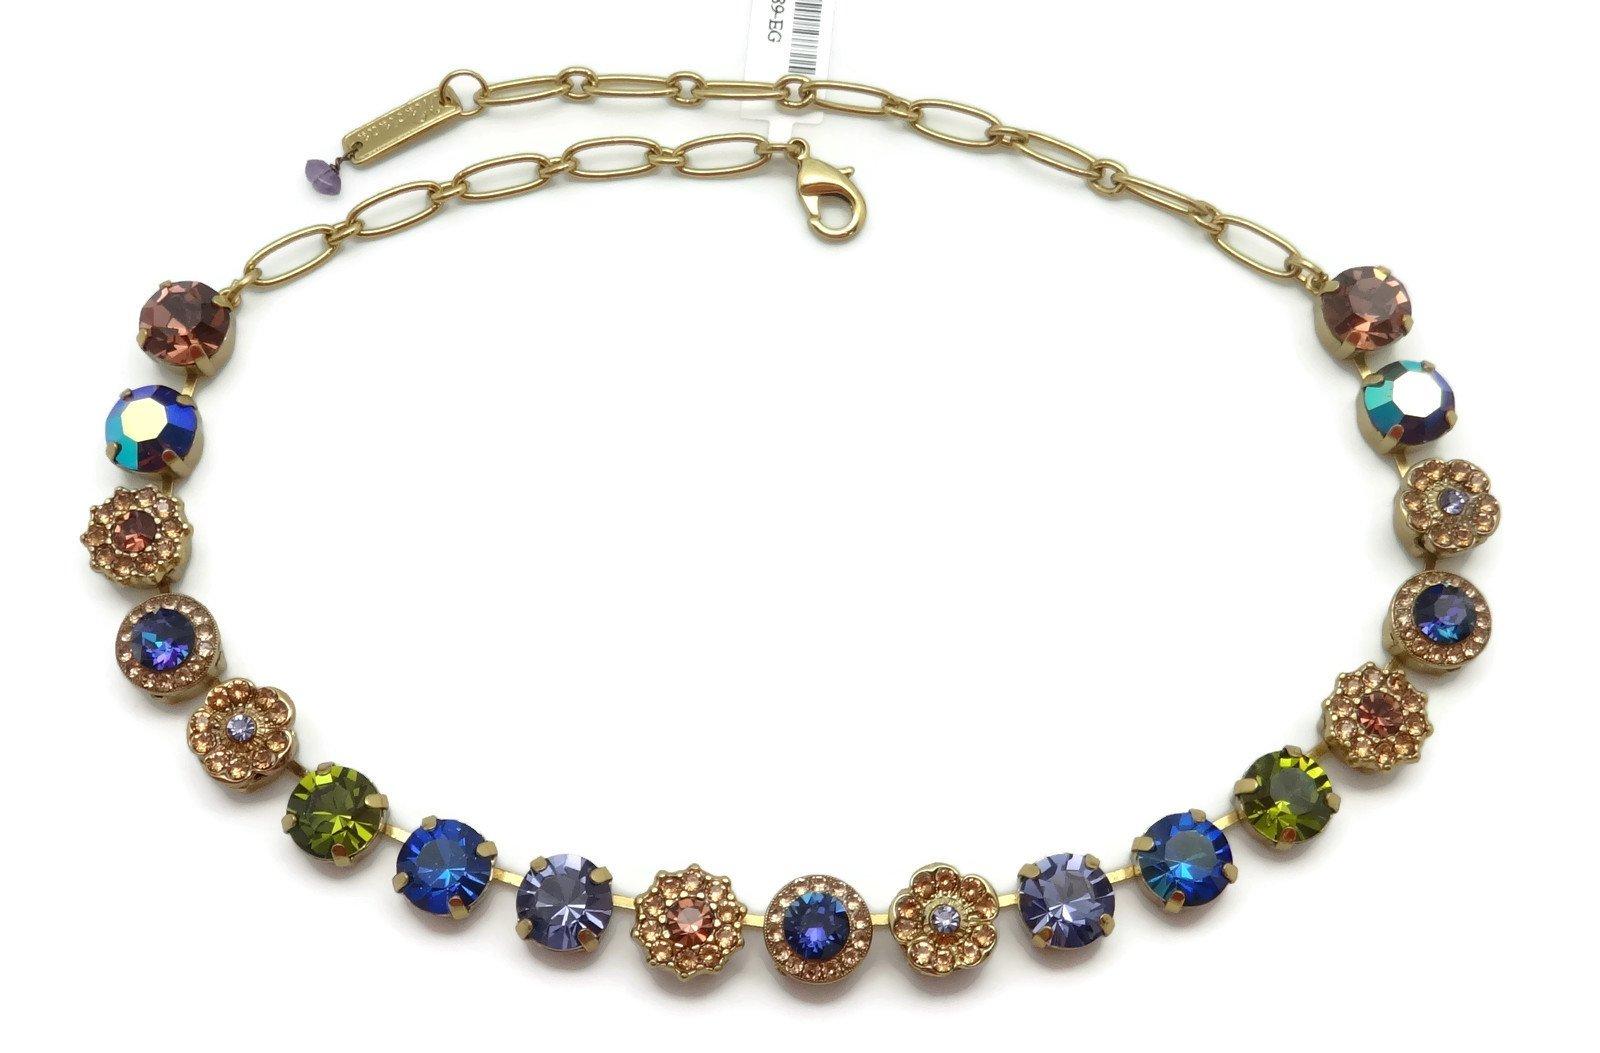 Mariana English Gold Plated Swarovski Crystal Necklace Multi Color Mosaic 1089 Odyssey Penelope by Mariana (Image #2)